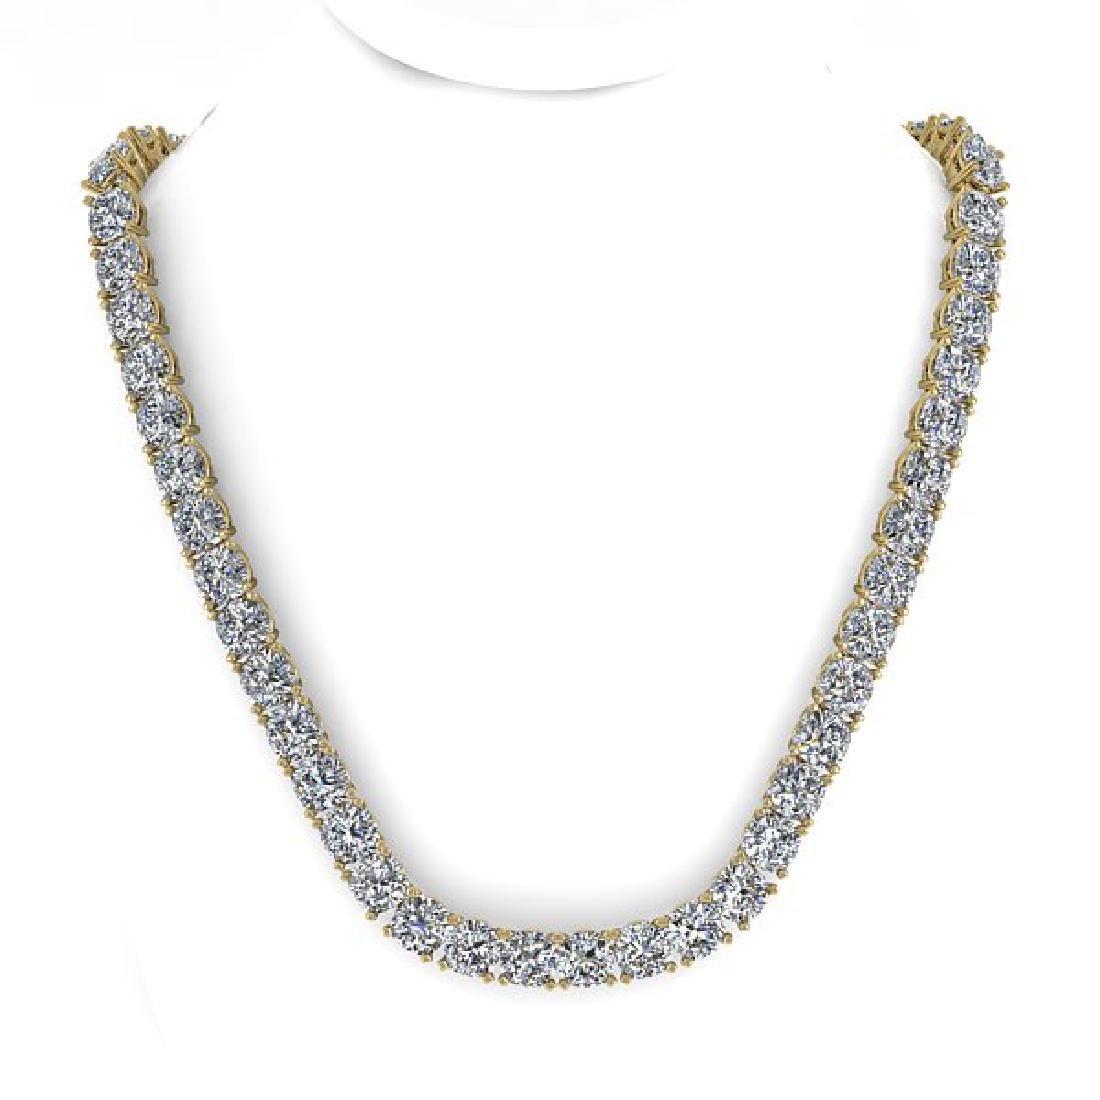 30 CTW Cushion Cut Certified SI Diamond Necklace 14K - 3